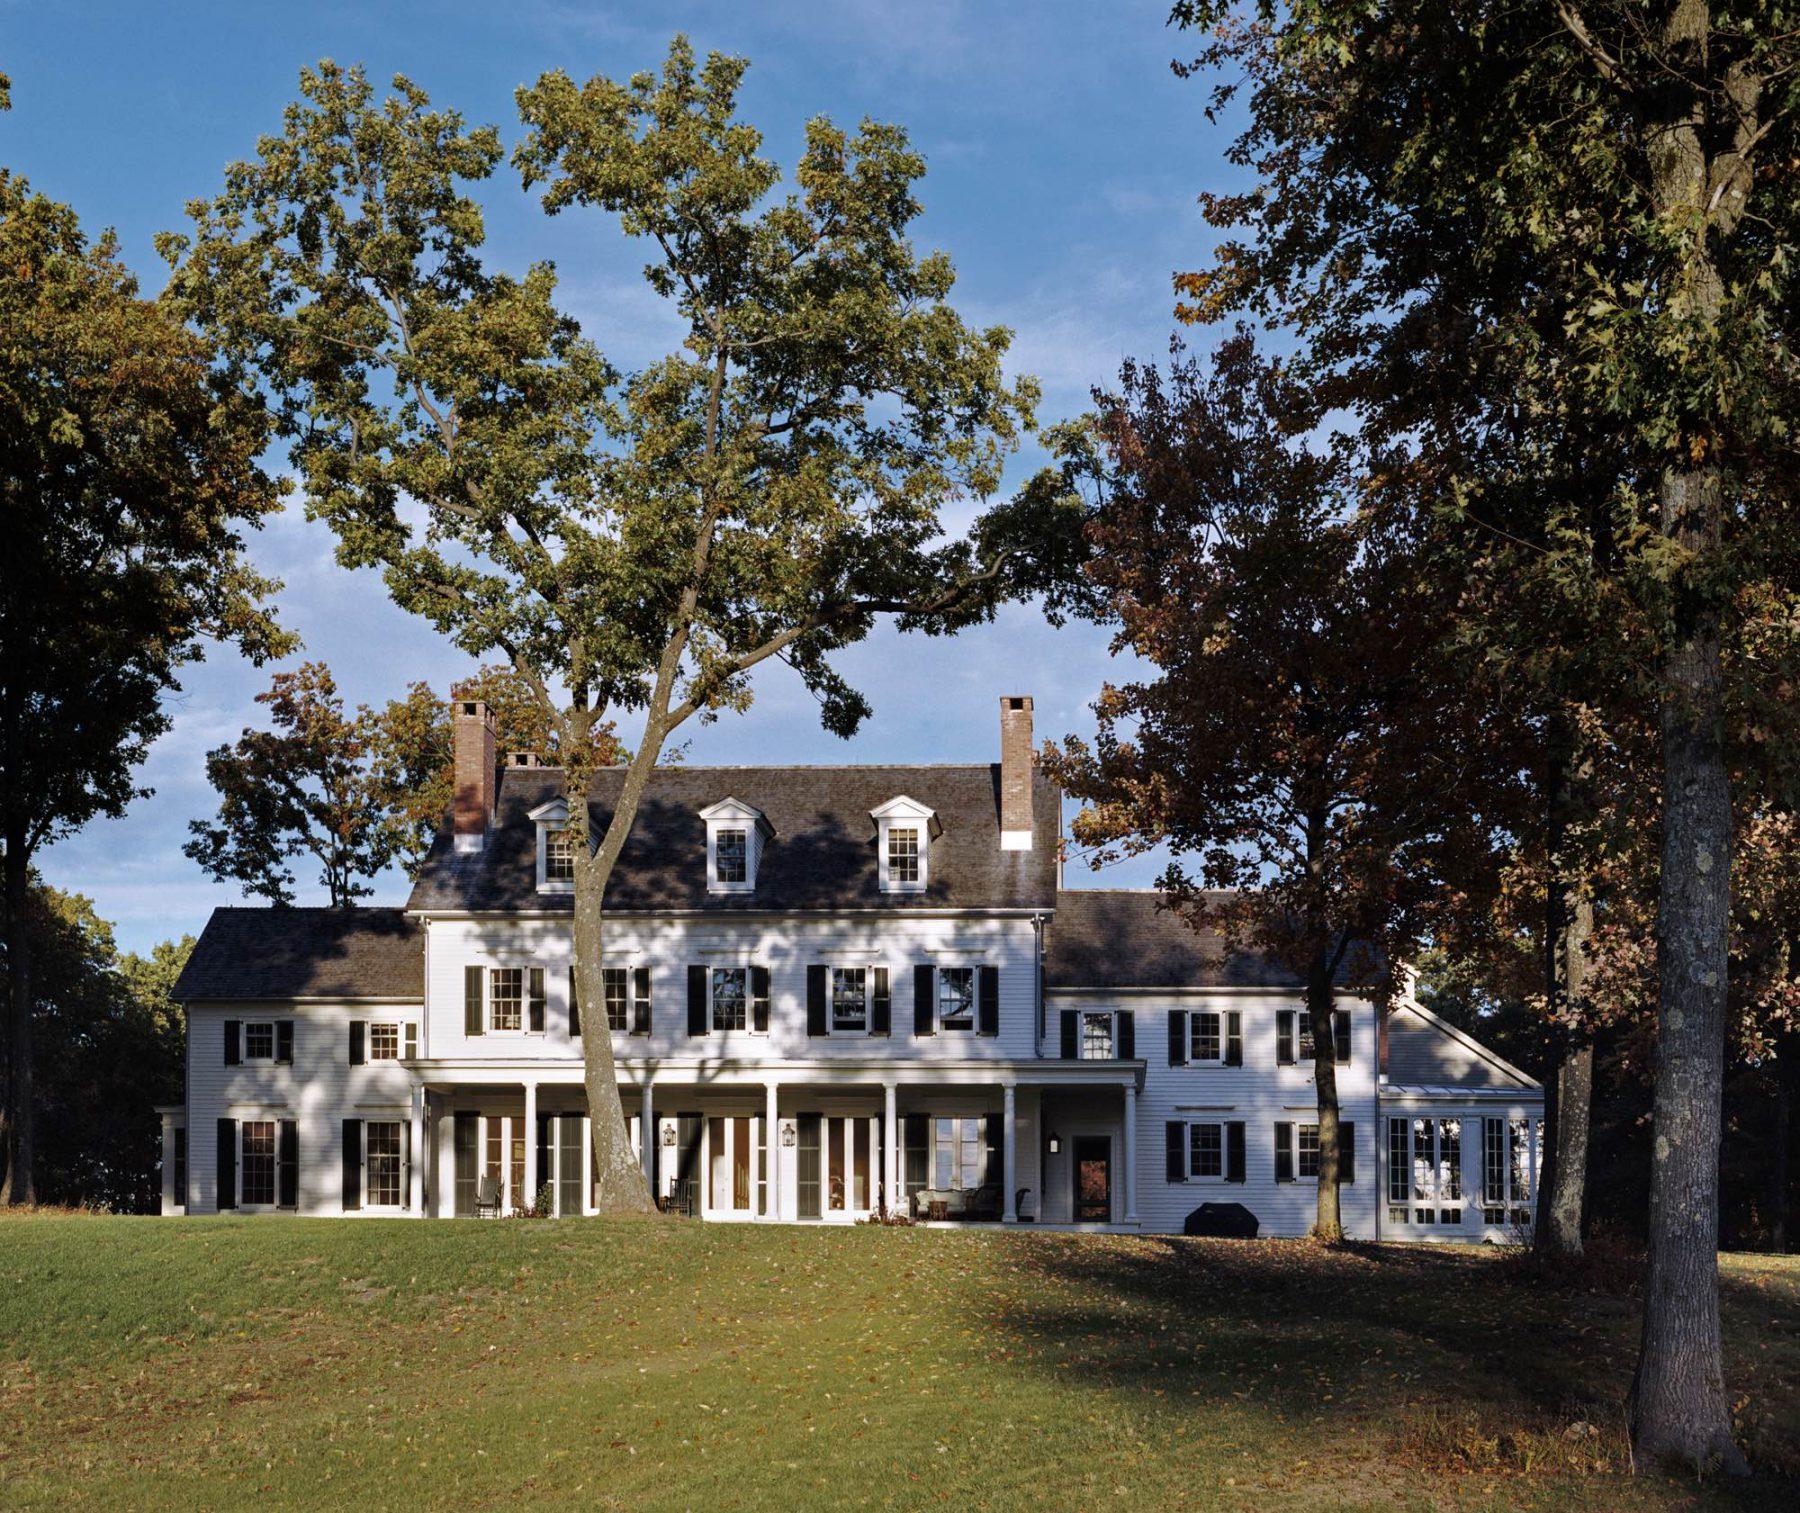 Horse Farm In Upstate New York G P Schafer Architect